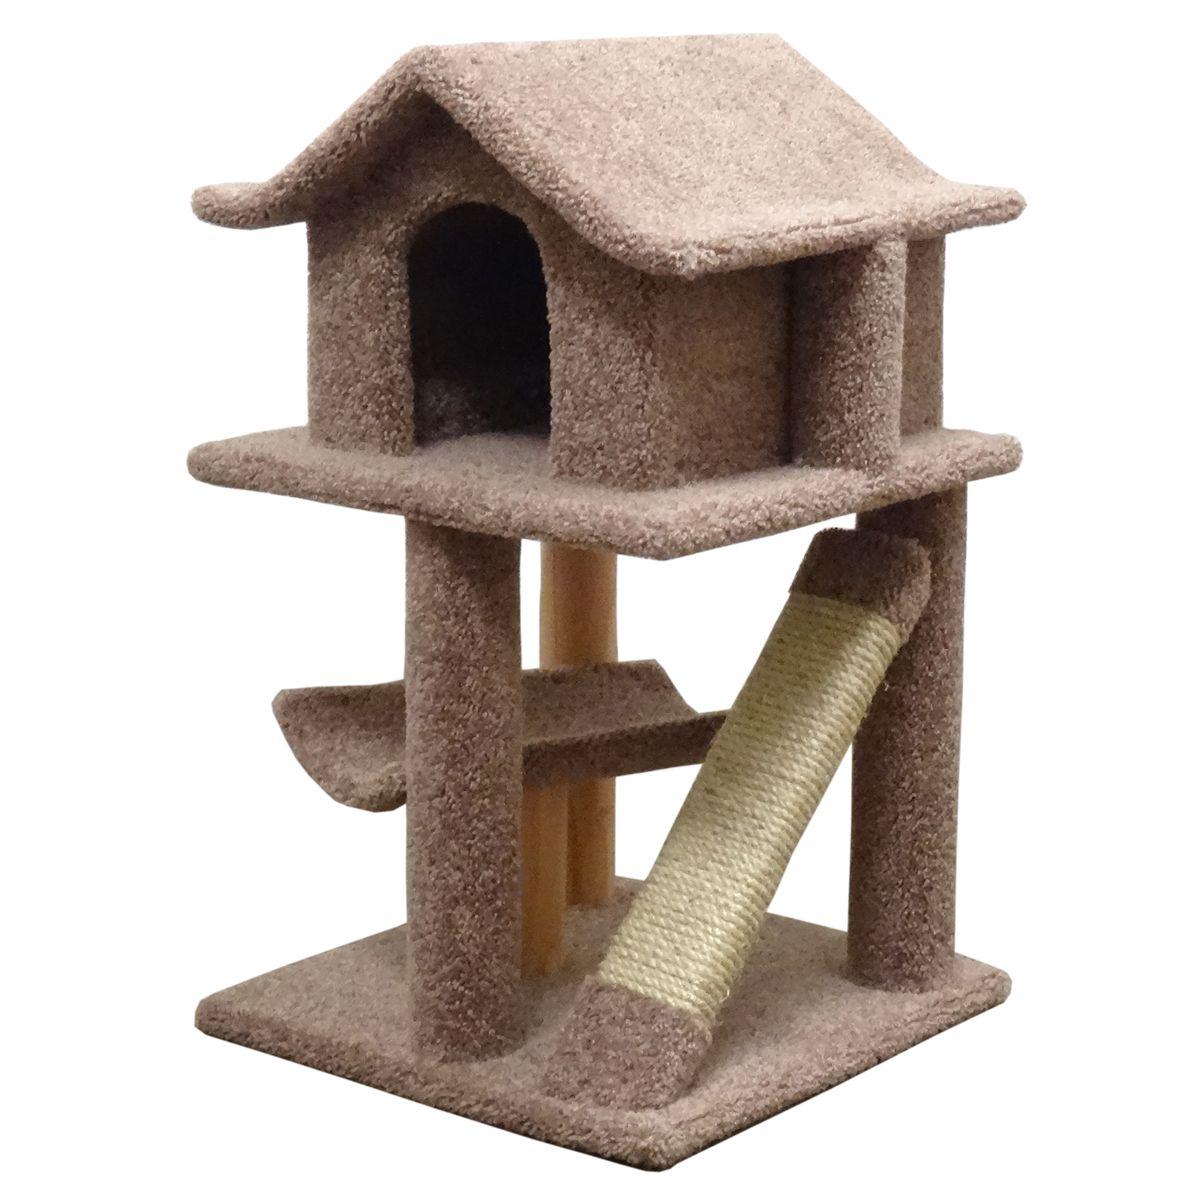 Carpet Pagoda Cat Furniture House Part 51